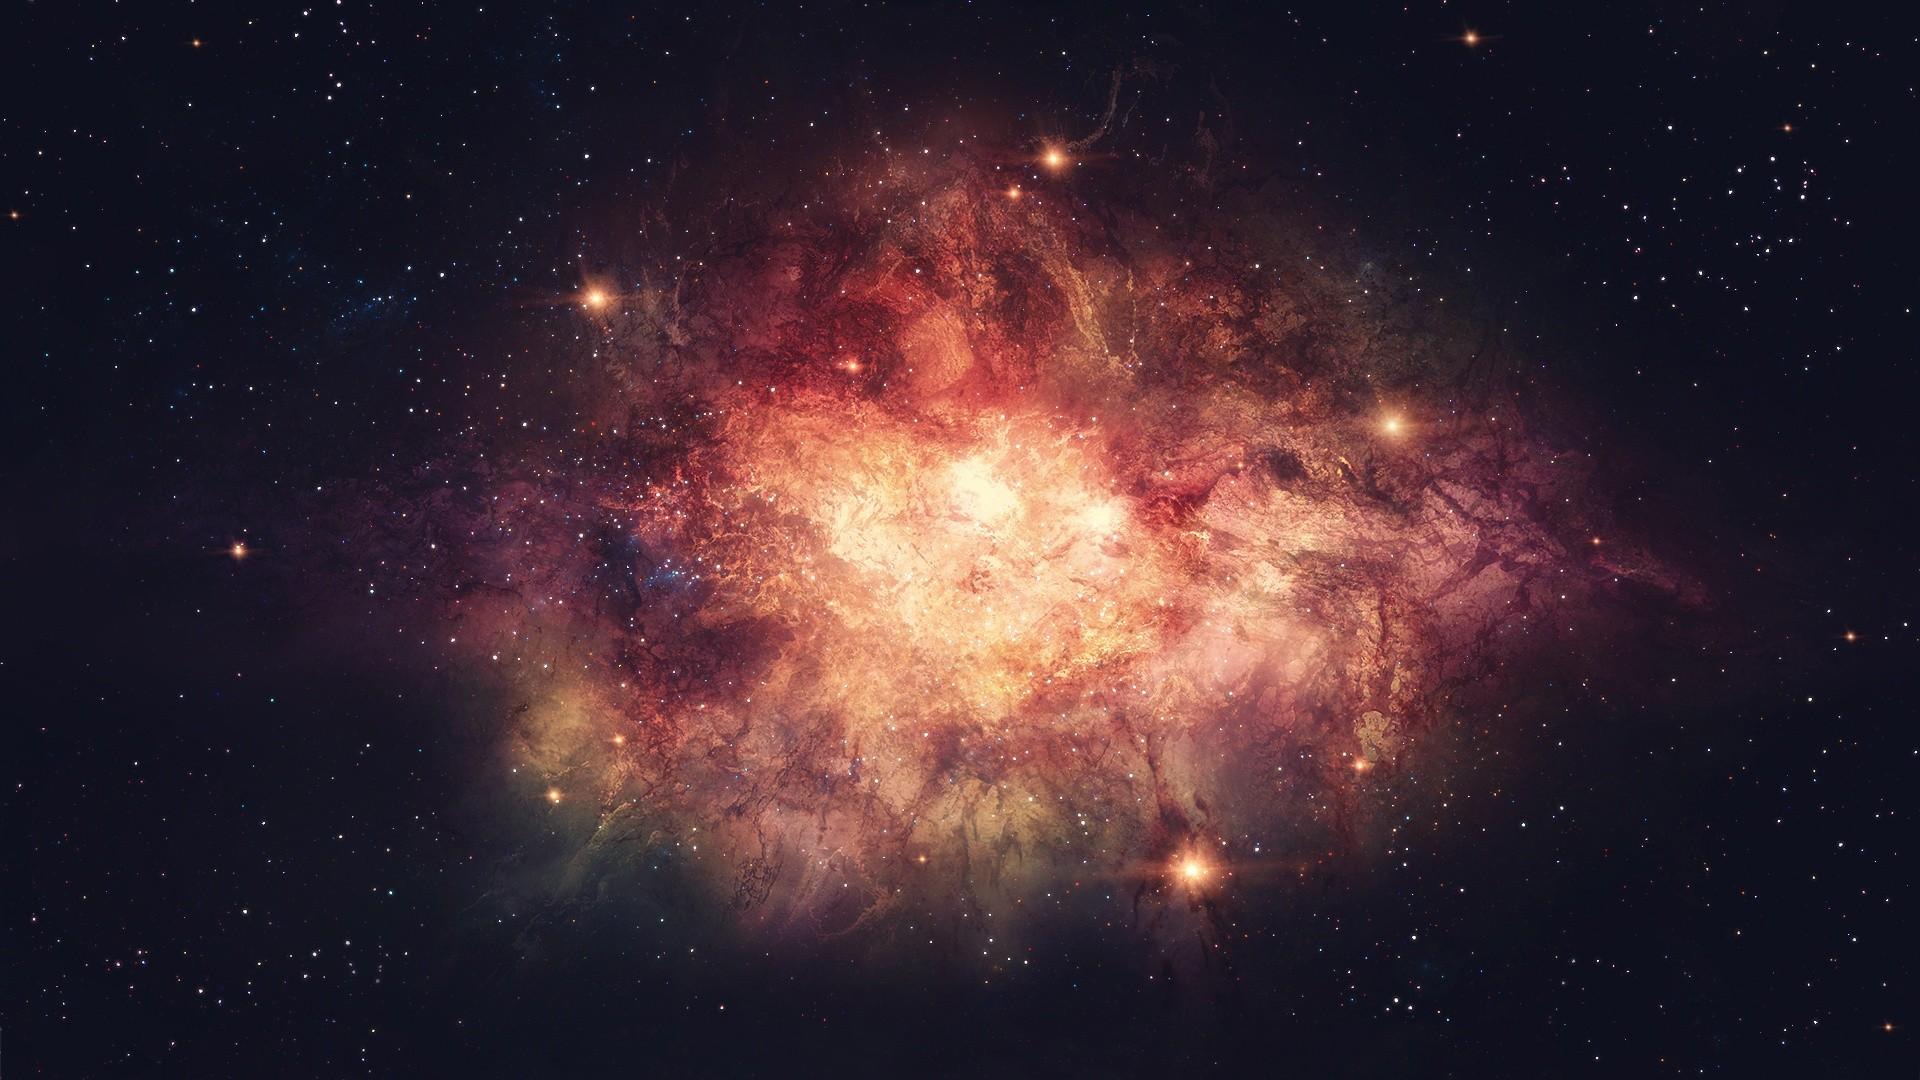 universe wallpaper 1920x1080 (87+ images)